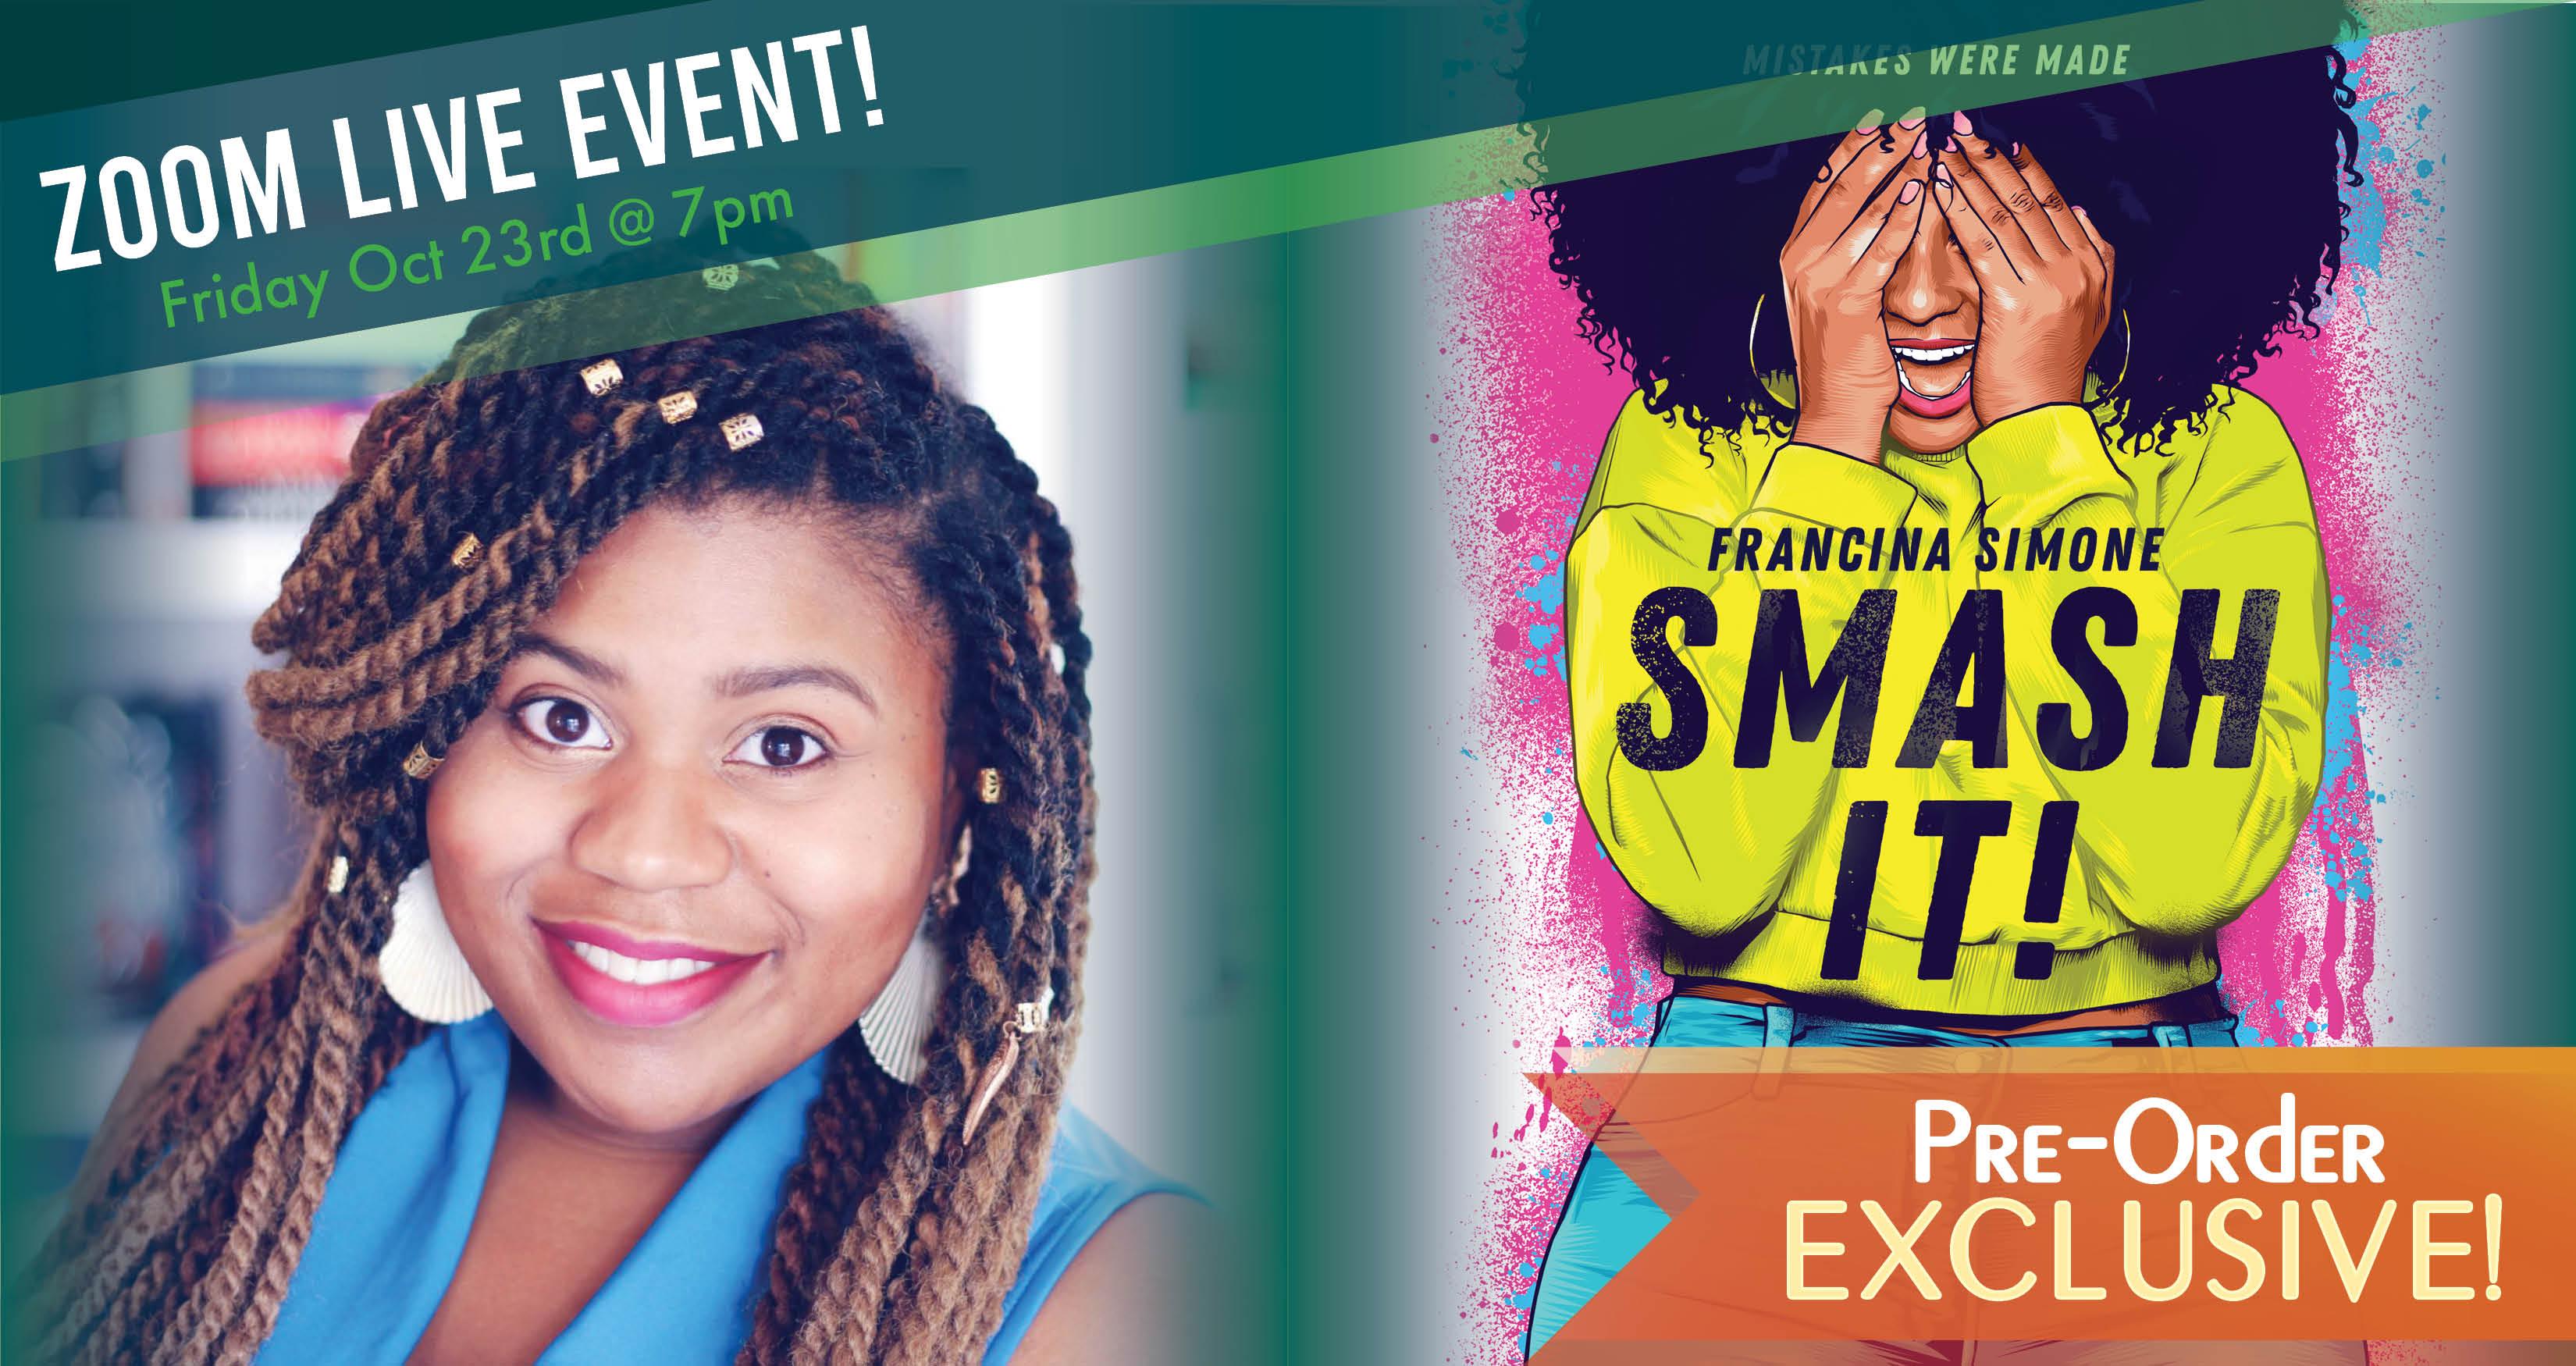 Pre-Order EXCLUSIVE: Francina Simone - Smash It!